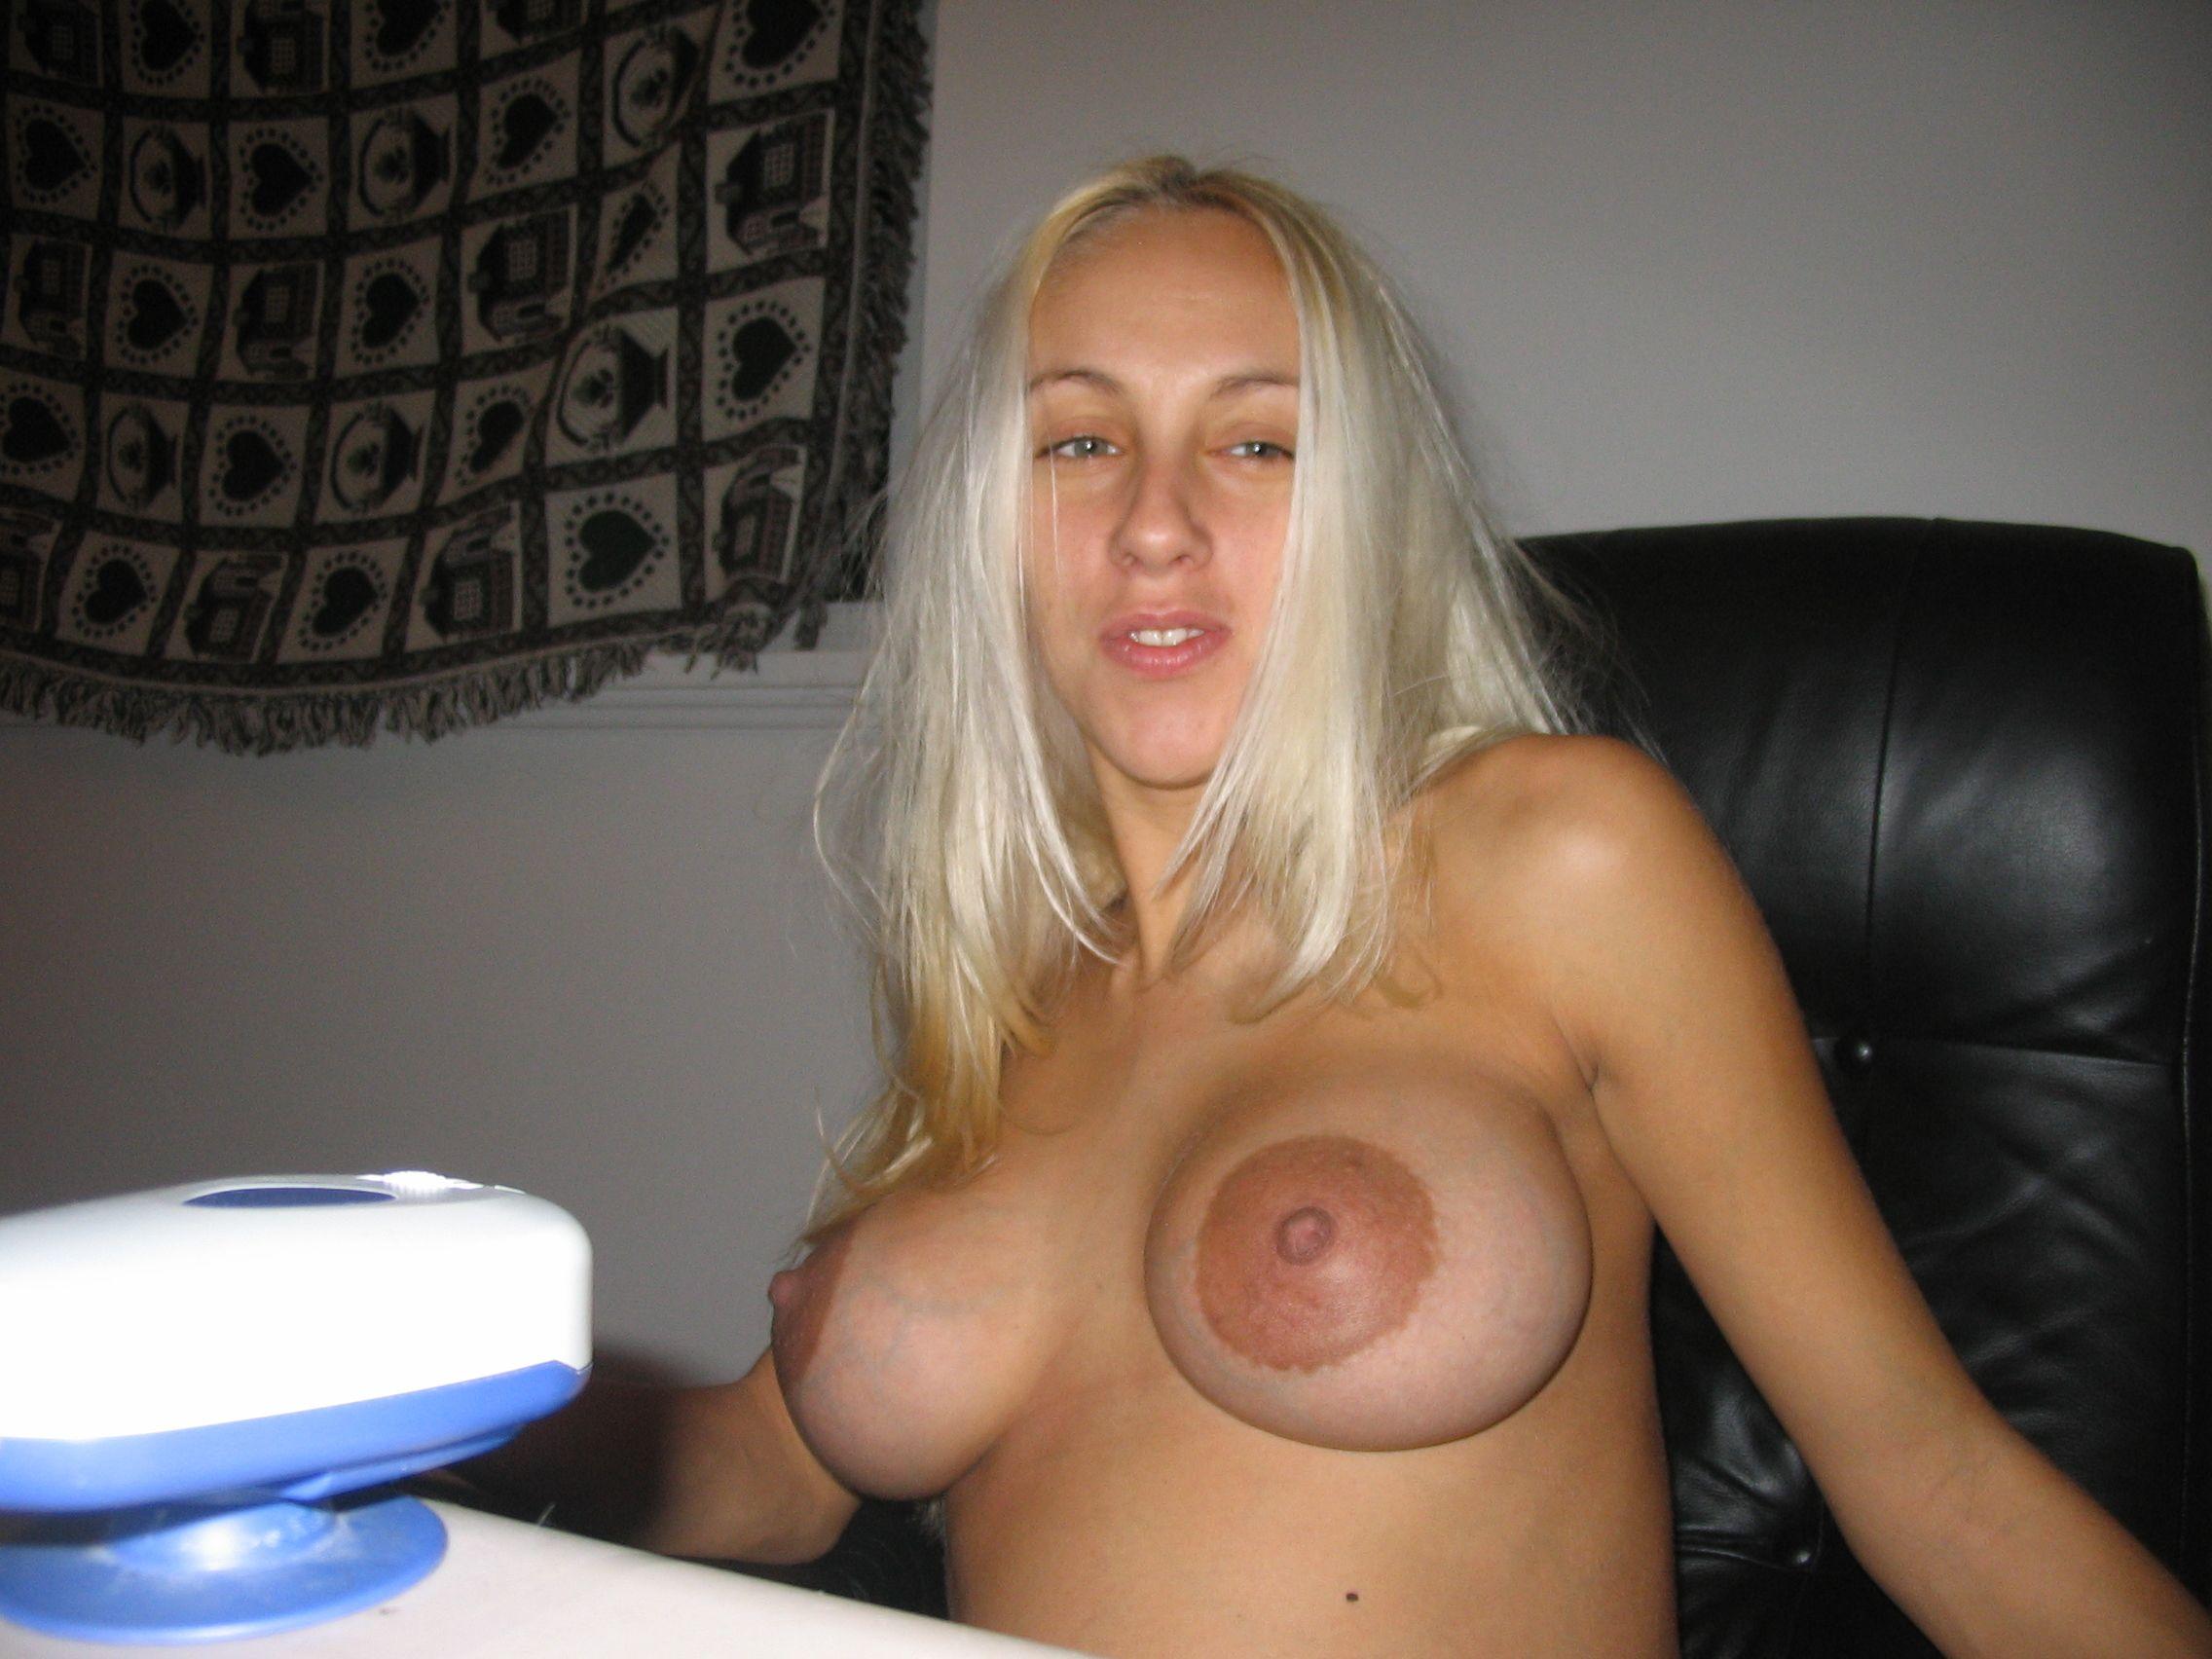 10759_amateurexpresszone.blogspot.com026_122_618lo.jpg